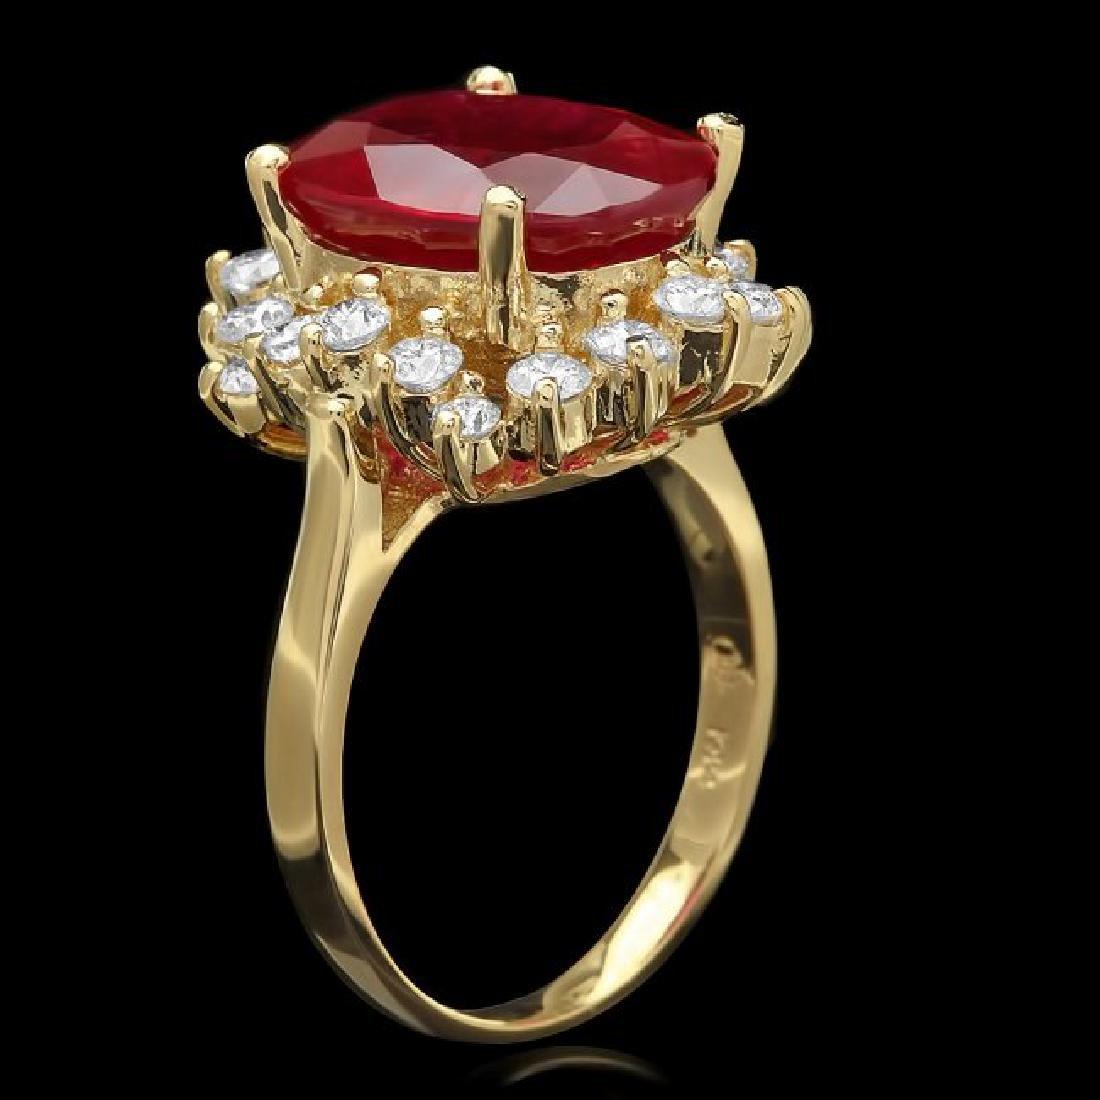 14k Yellow Gold 7.50ct Ruby 1.00ct Diamond Ring - 2